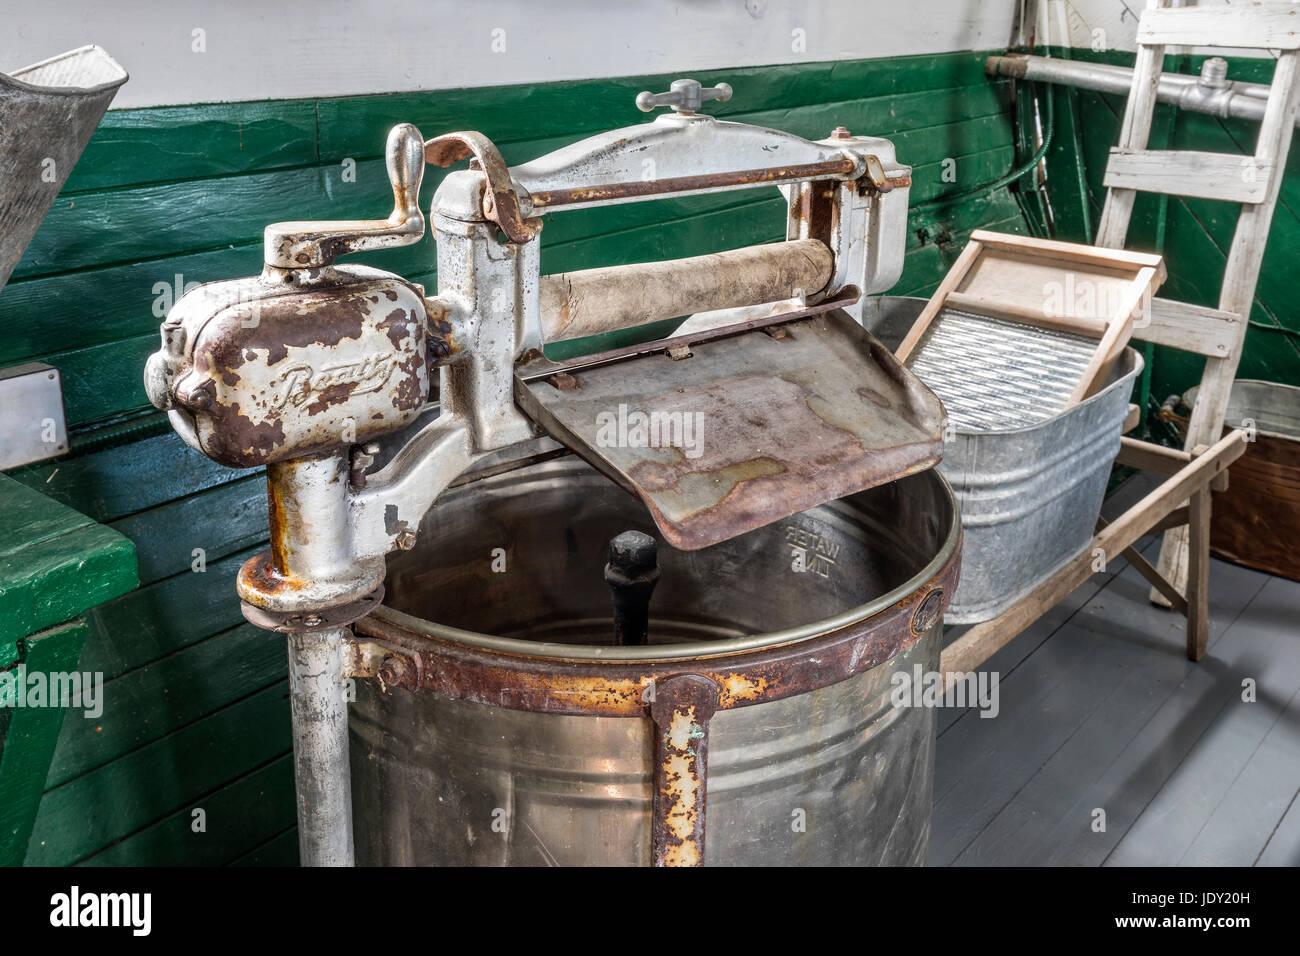 A vintage Beatty washing machine, (circa 1920s) - Stock Image